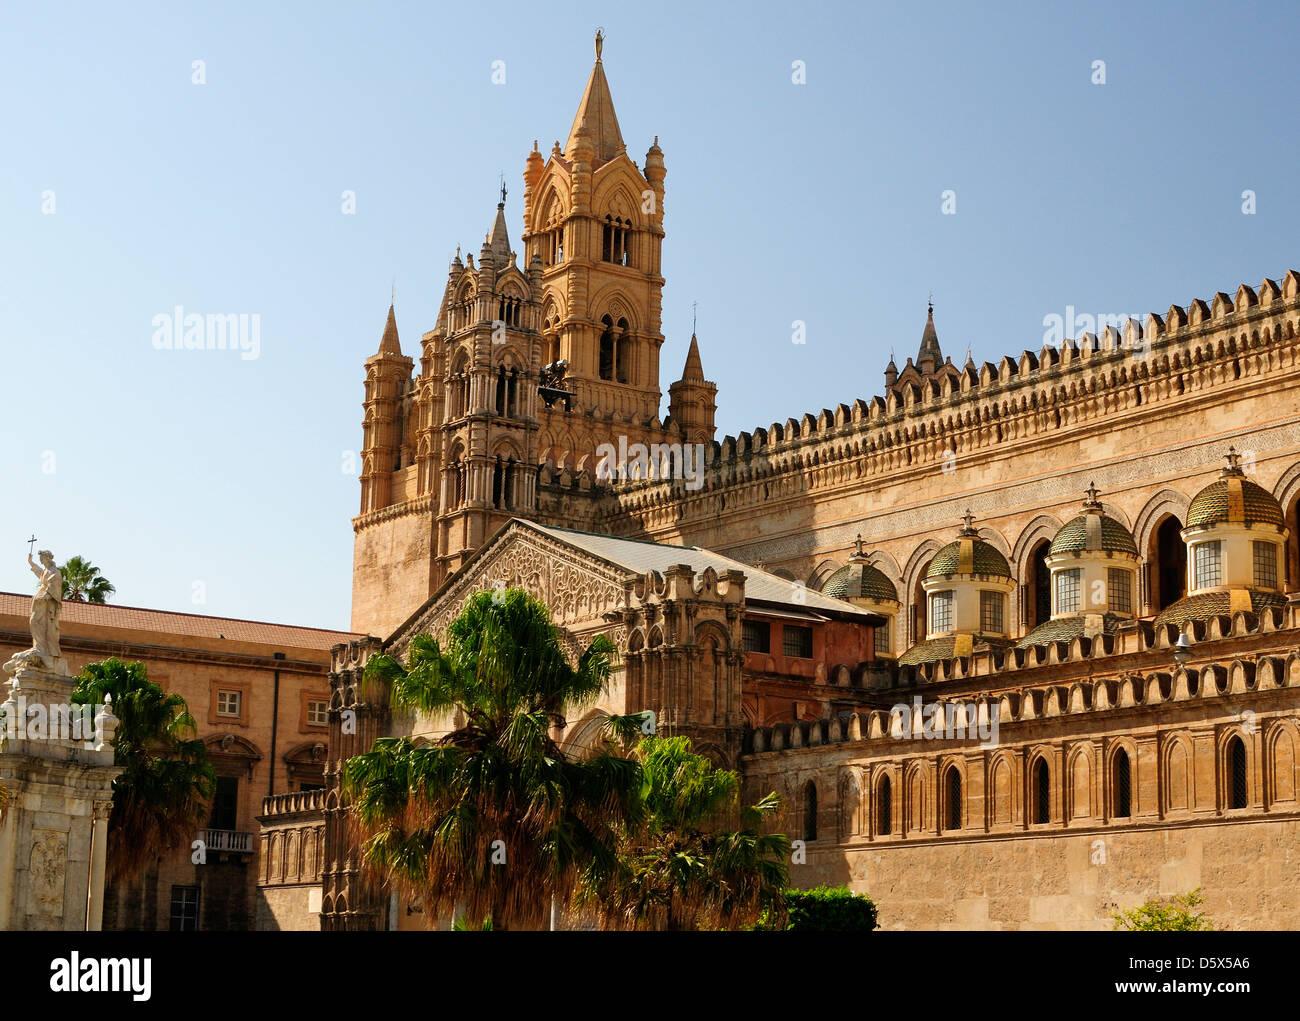 The Baroque small side cupolas by Ferdinando Fuga., Palermo Cathredal - Stock Image